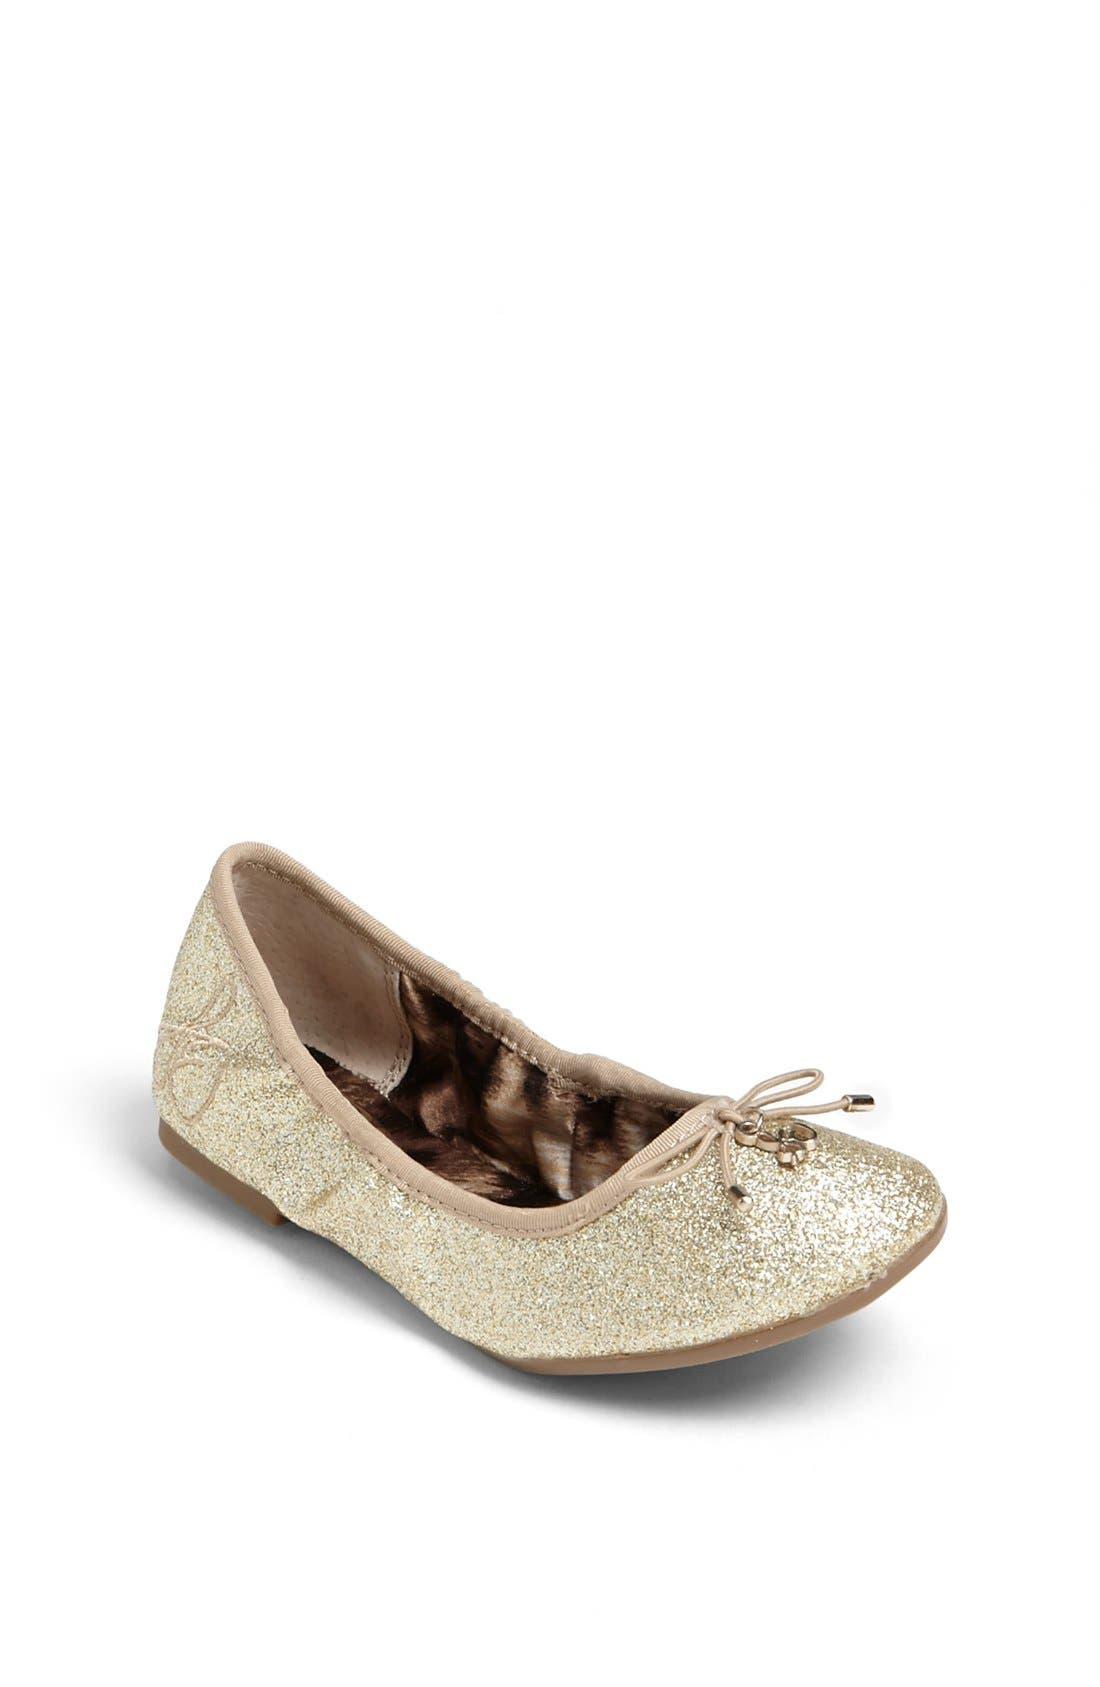 Main Image - Sam Edelman 'Fiona' Glitter Ballerina Flat (Toddler, Little Kid & Big Kid)